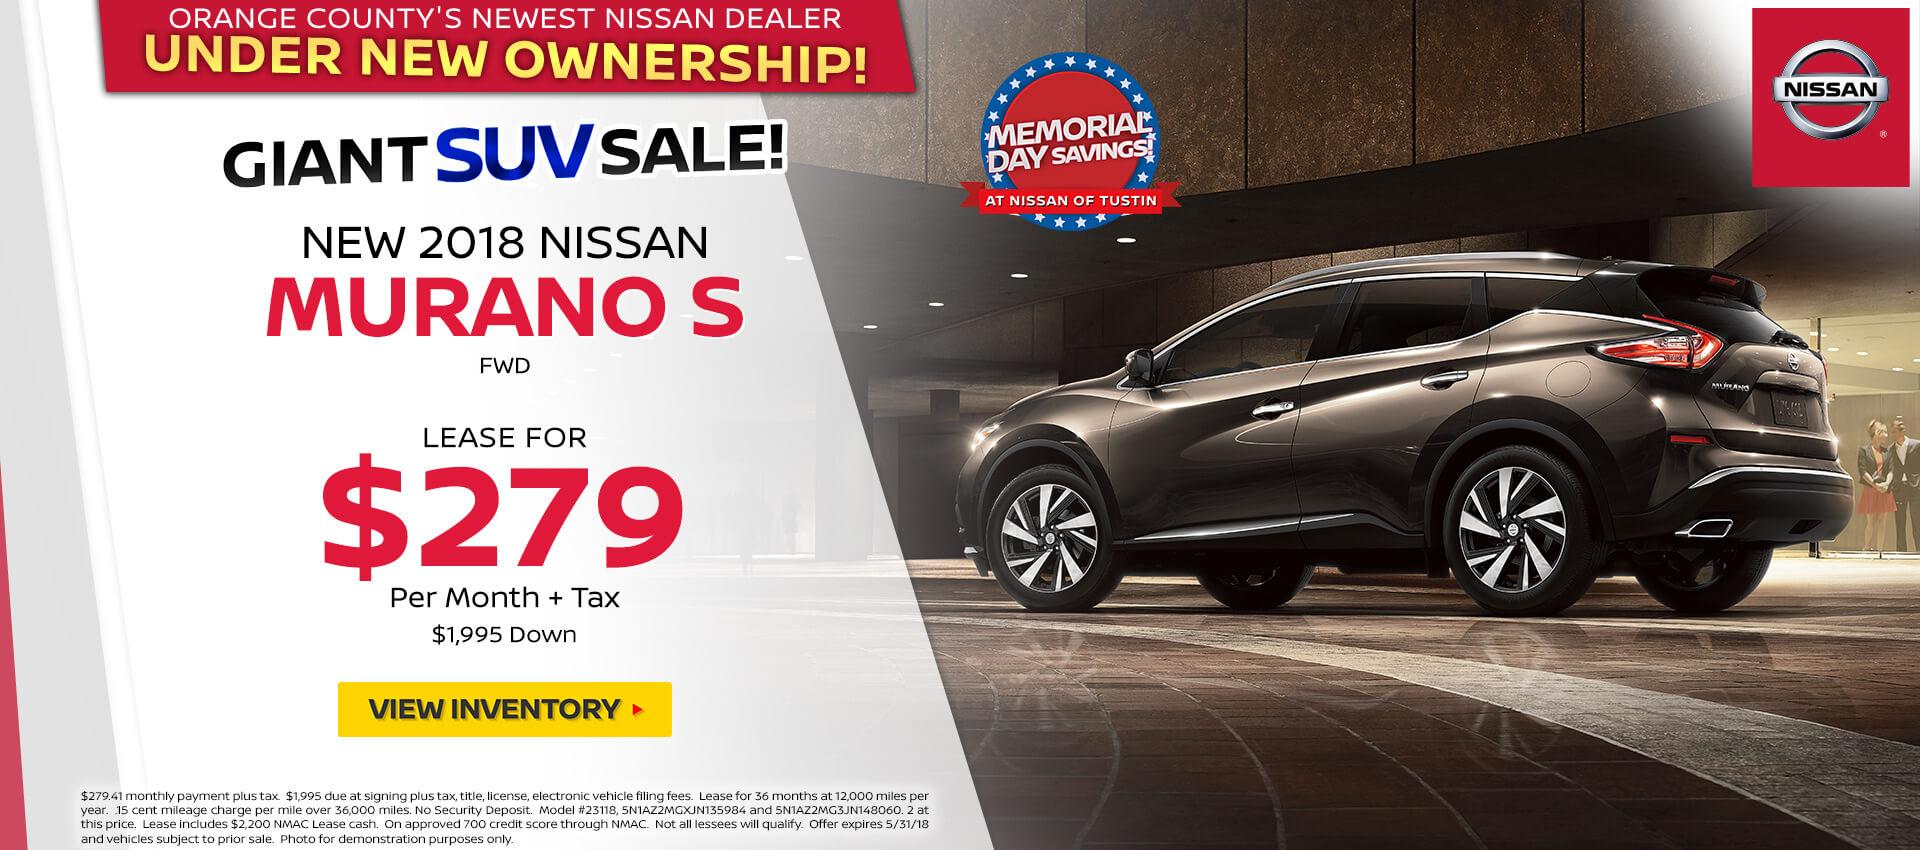 2018 Nissan Murano $279 Lease